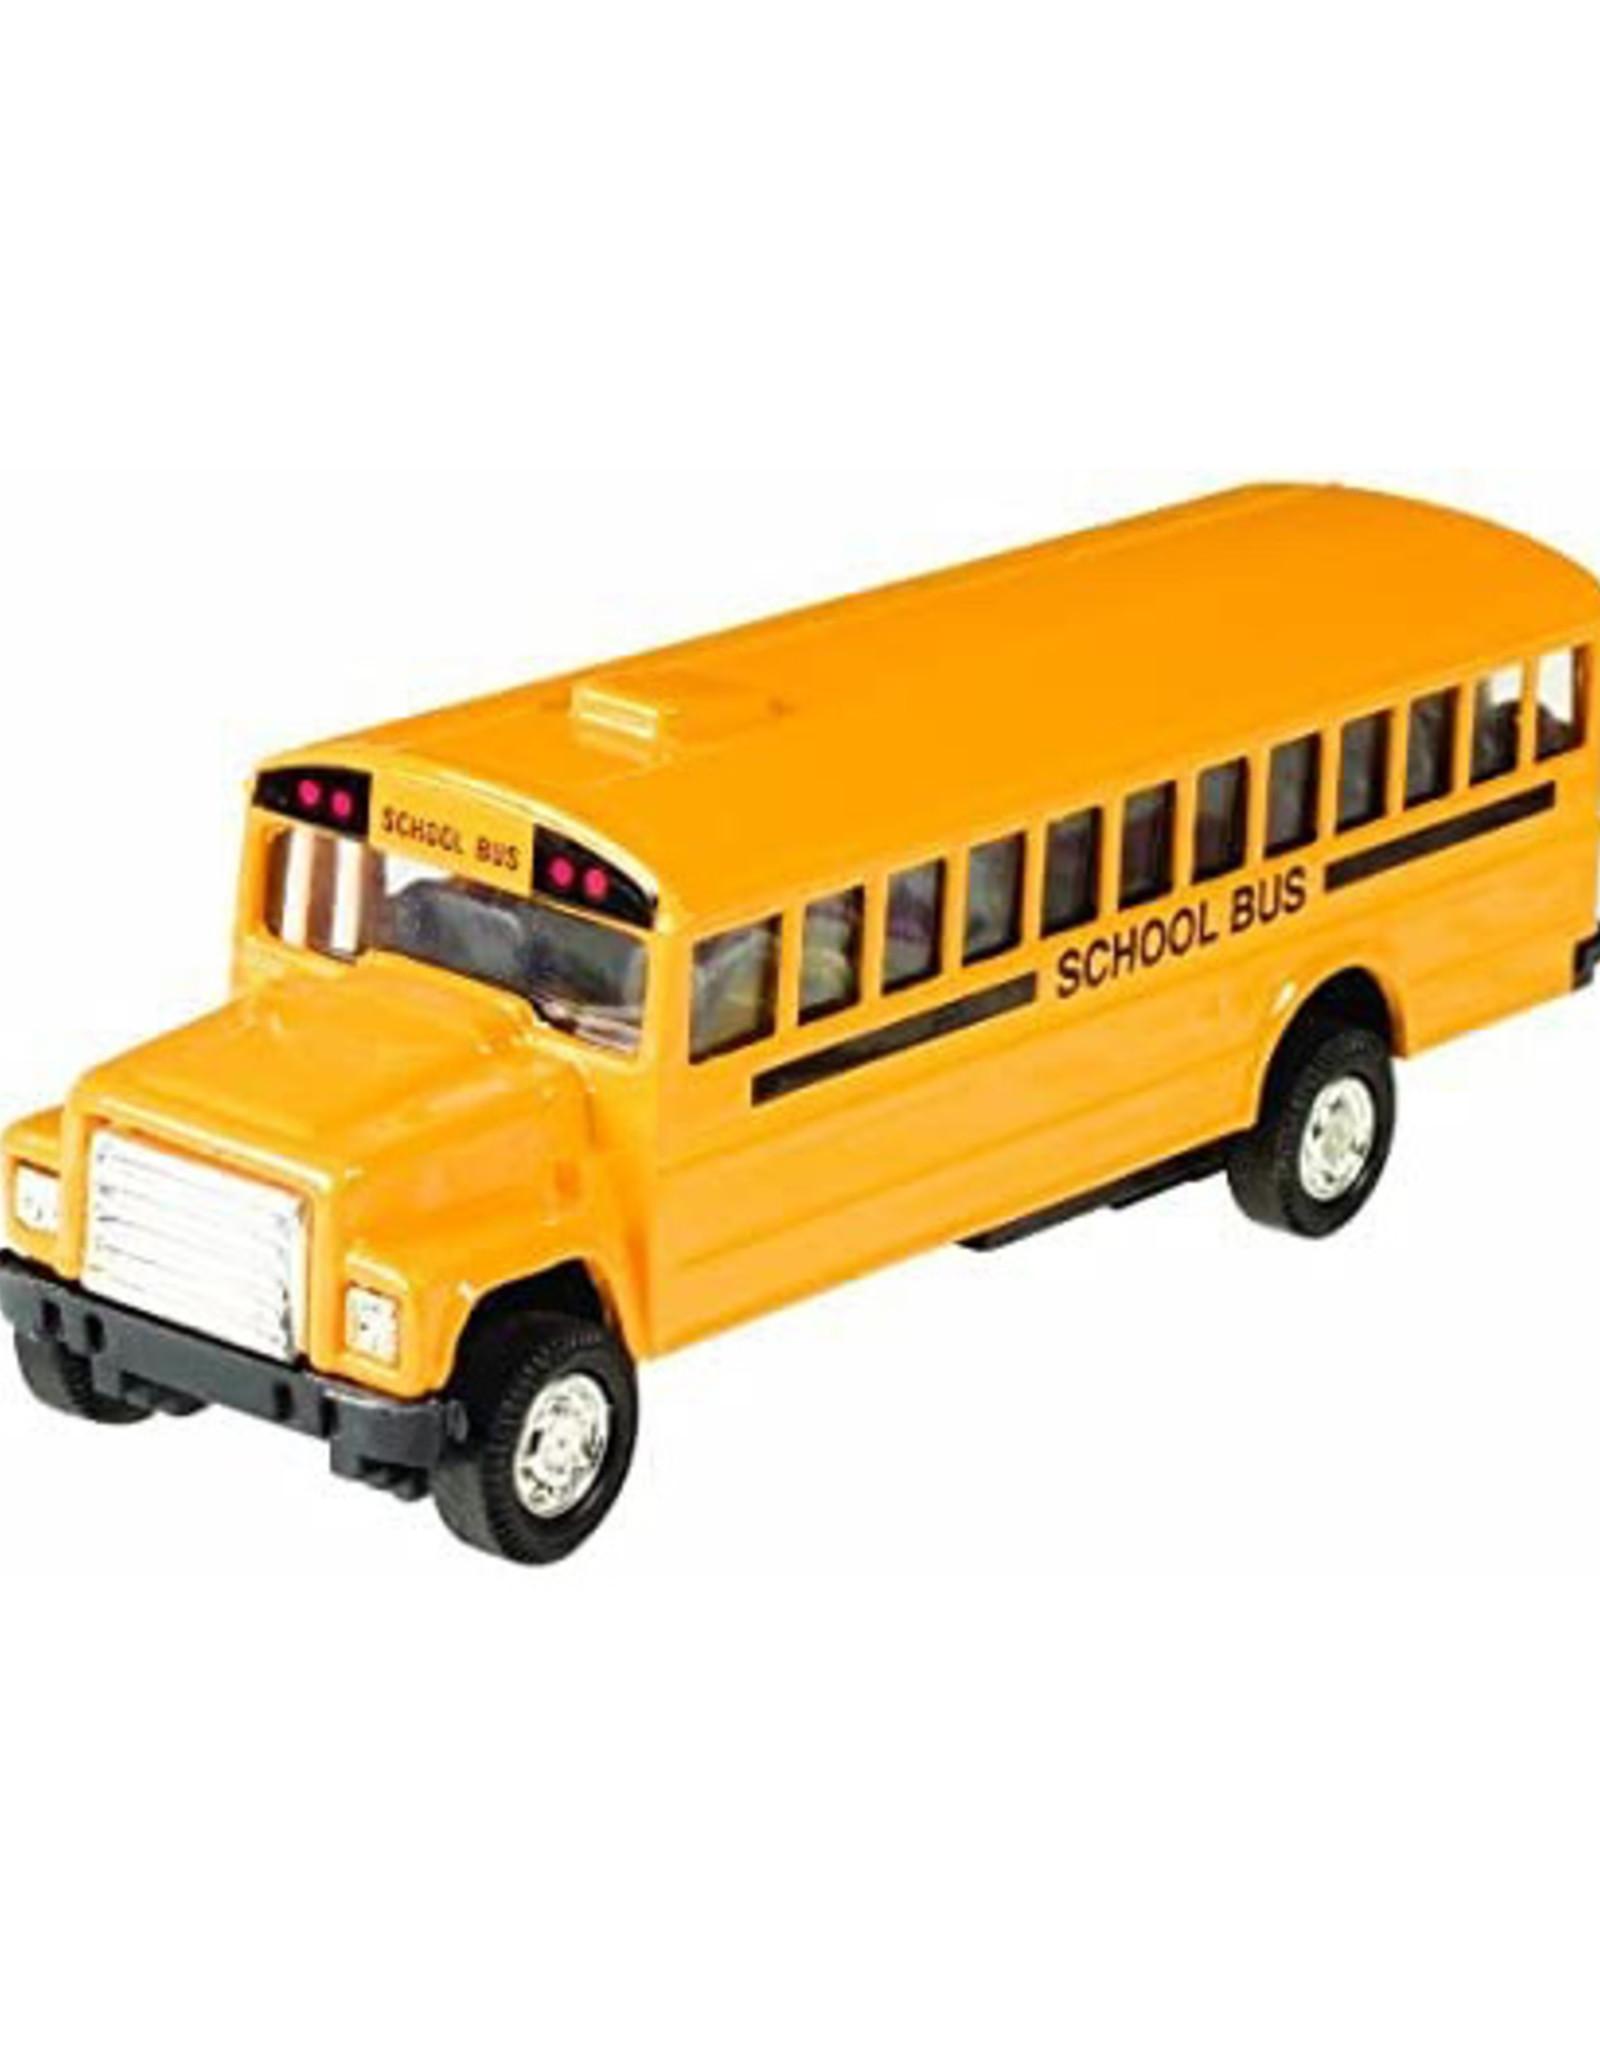 P/B SCHOOL BUS